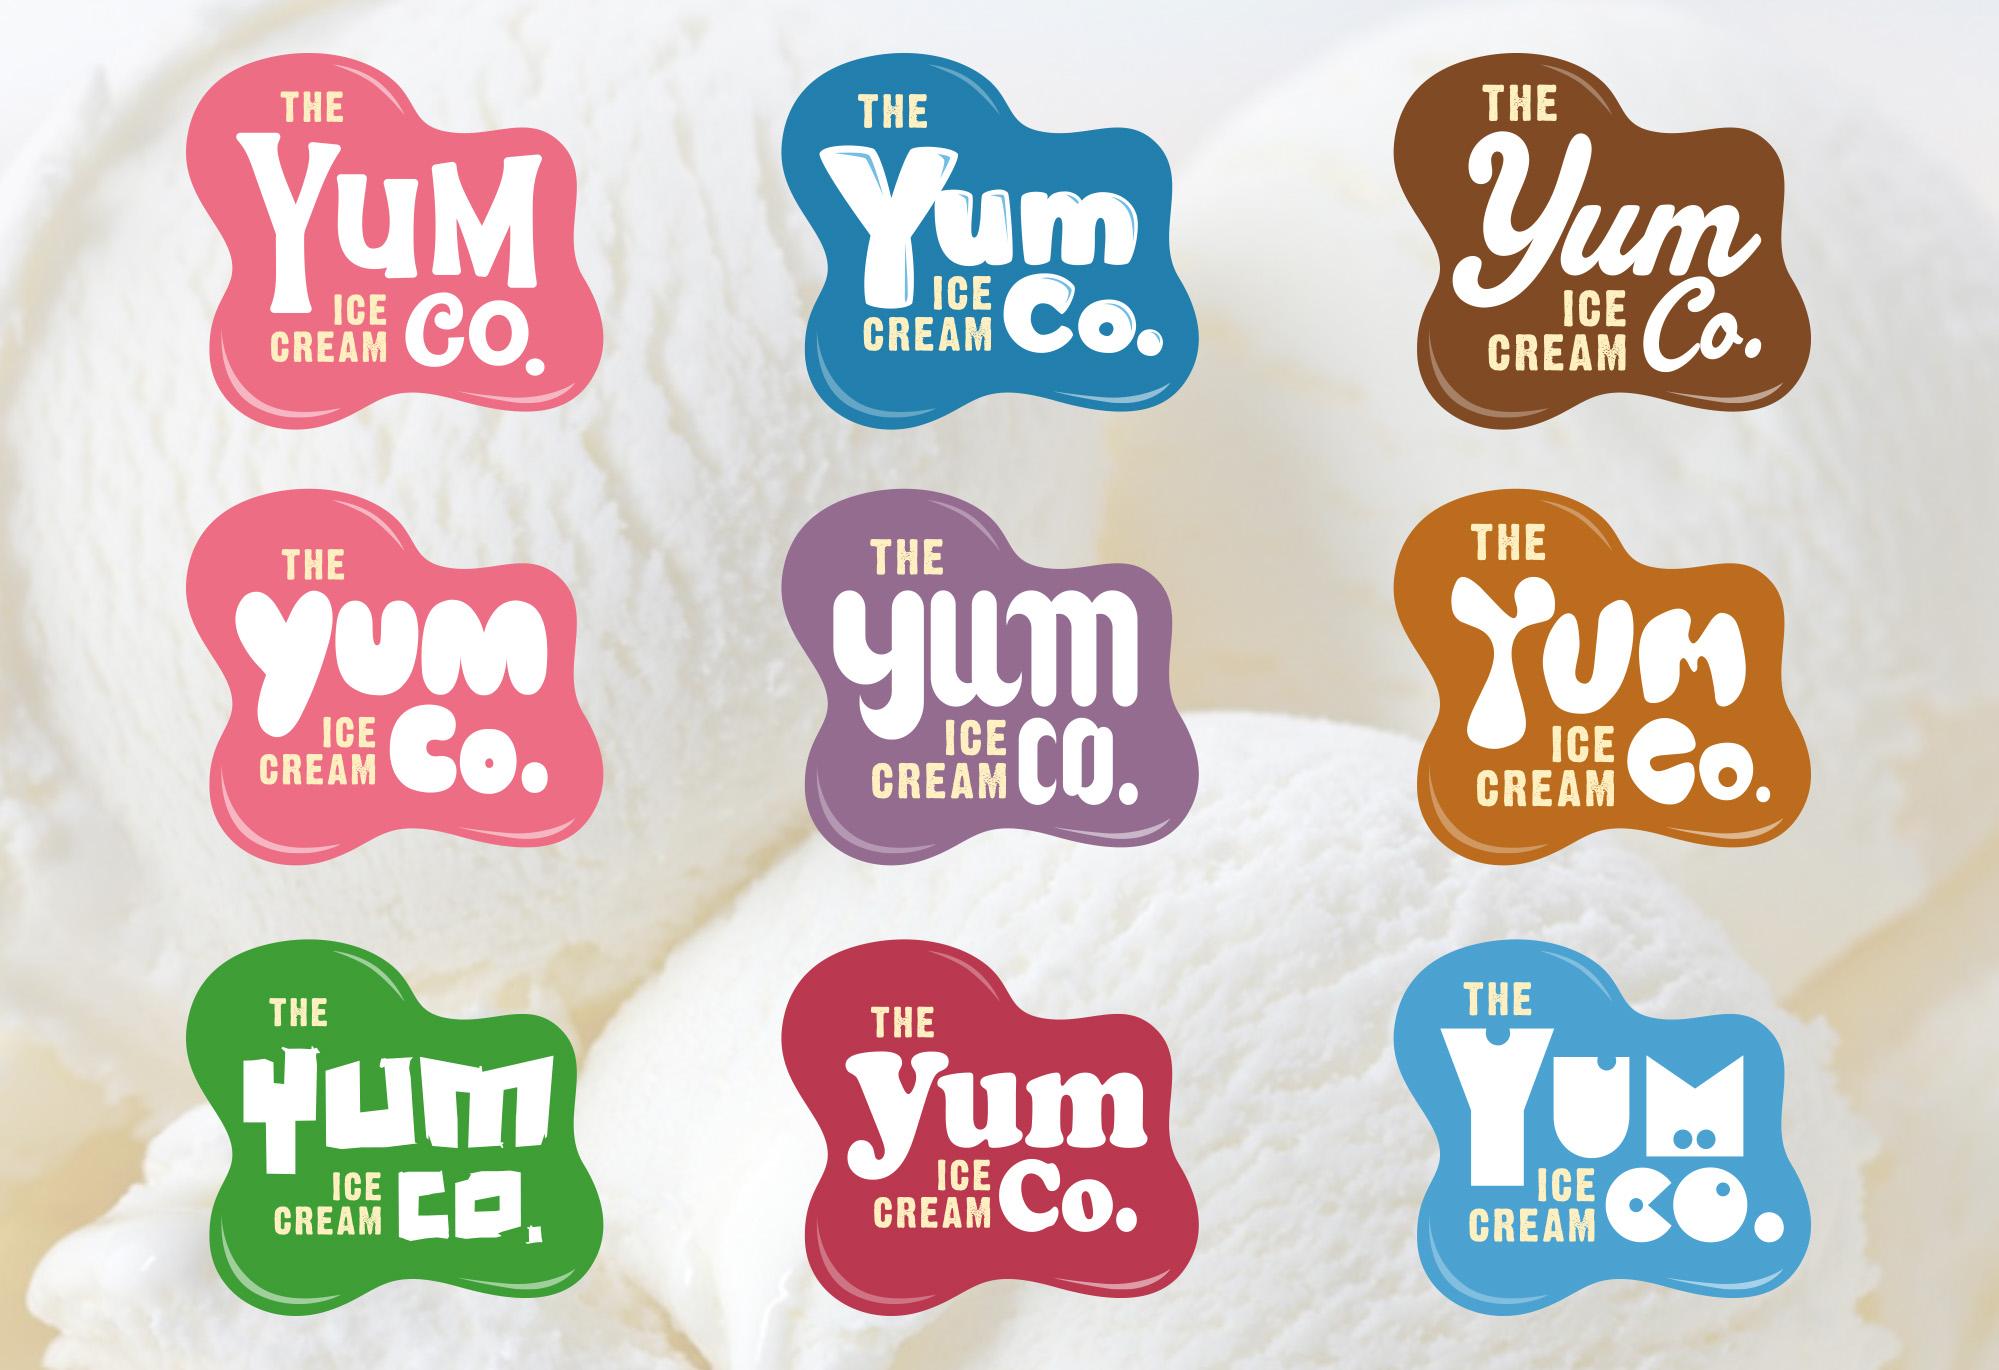 Pizza Hut The Yum Ice Cream Co. logo